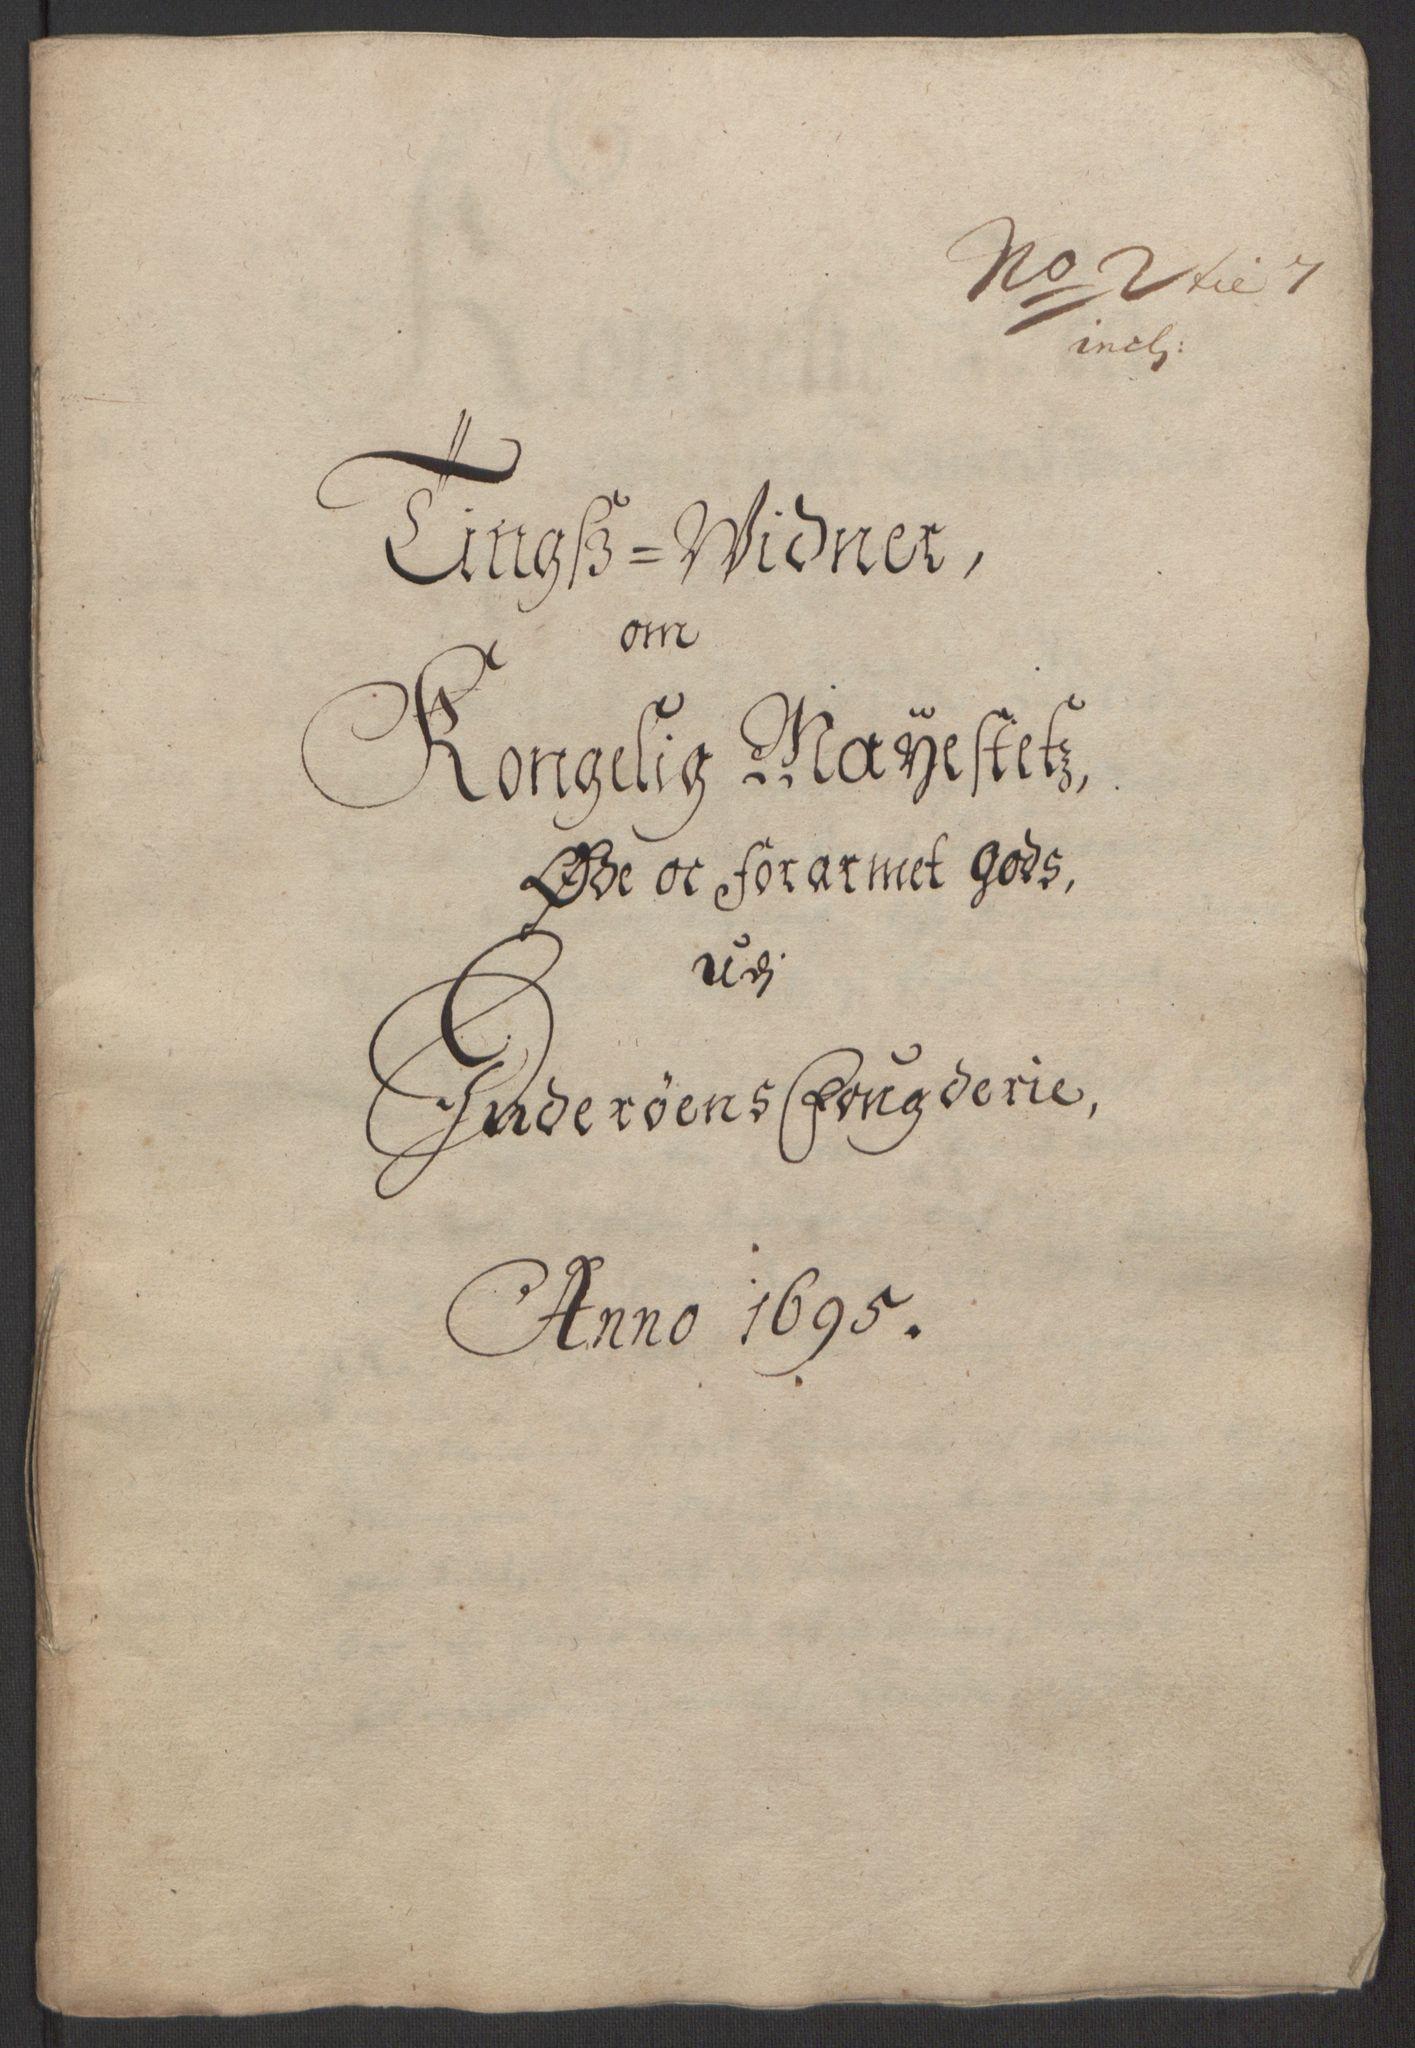 RA, Rentekammeret inntil 1814, Reviderte regnskaper, Fogderegnskap, R63/L4309: Fogderegnskap Inderøy, 1695-1697, s. 79